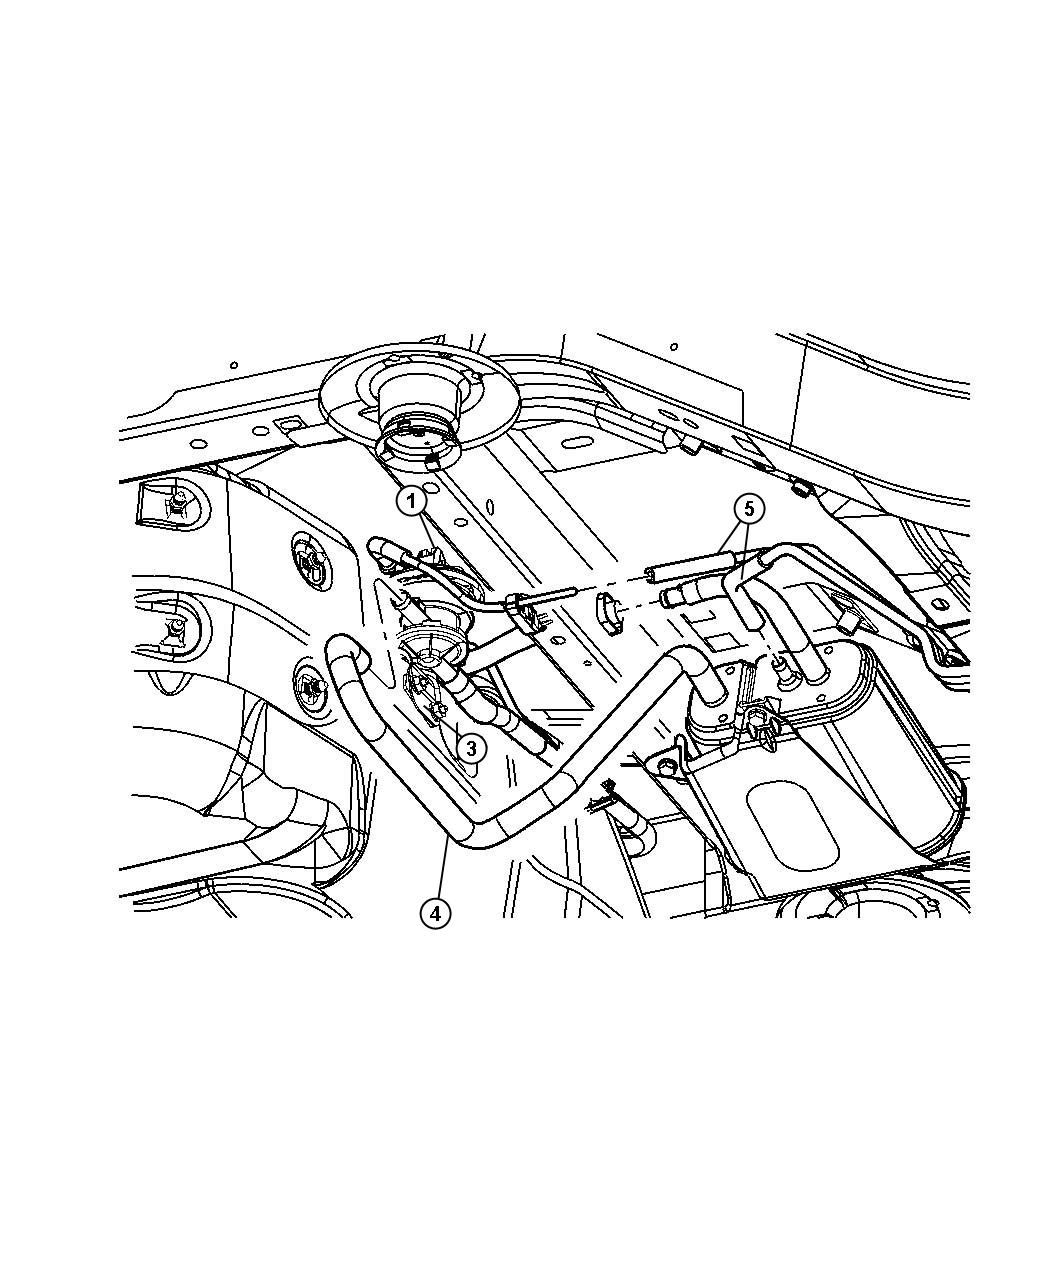 Jeep Liberty Leak Detection Pump 3 7l All 3 7l 6 Cyl